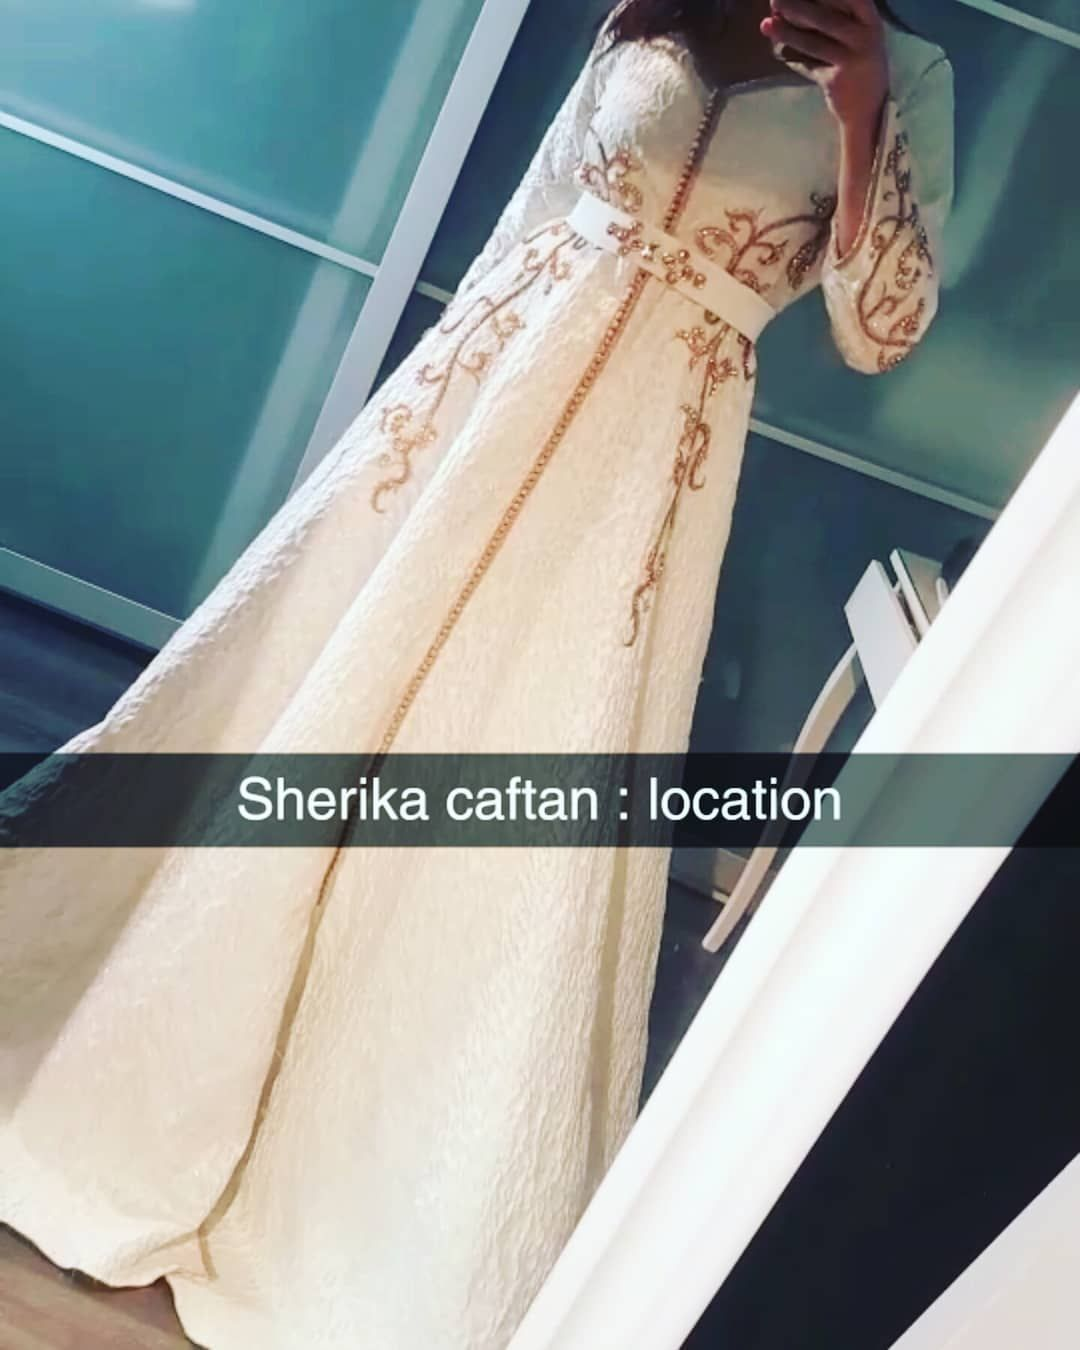 177 mentions J'aime, 8 commentaires - Sherika Caftan (@sherikacaftan) sur Instagram :